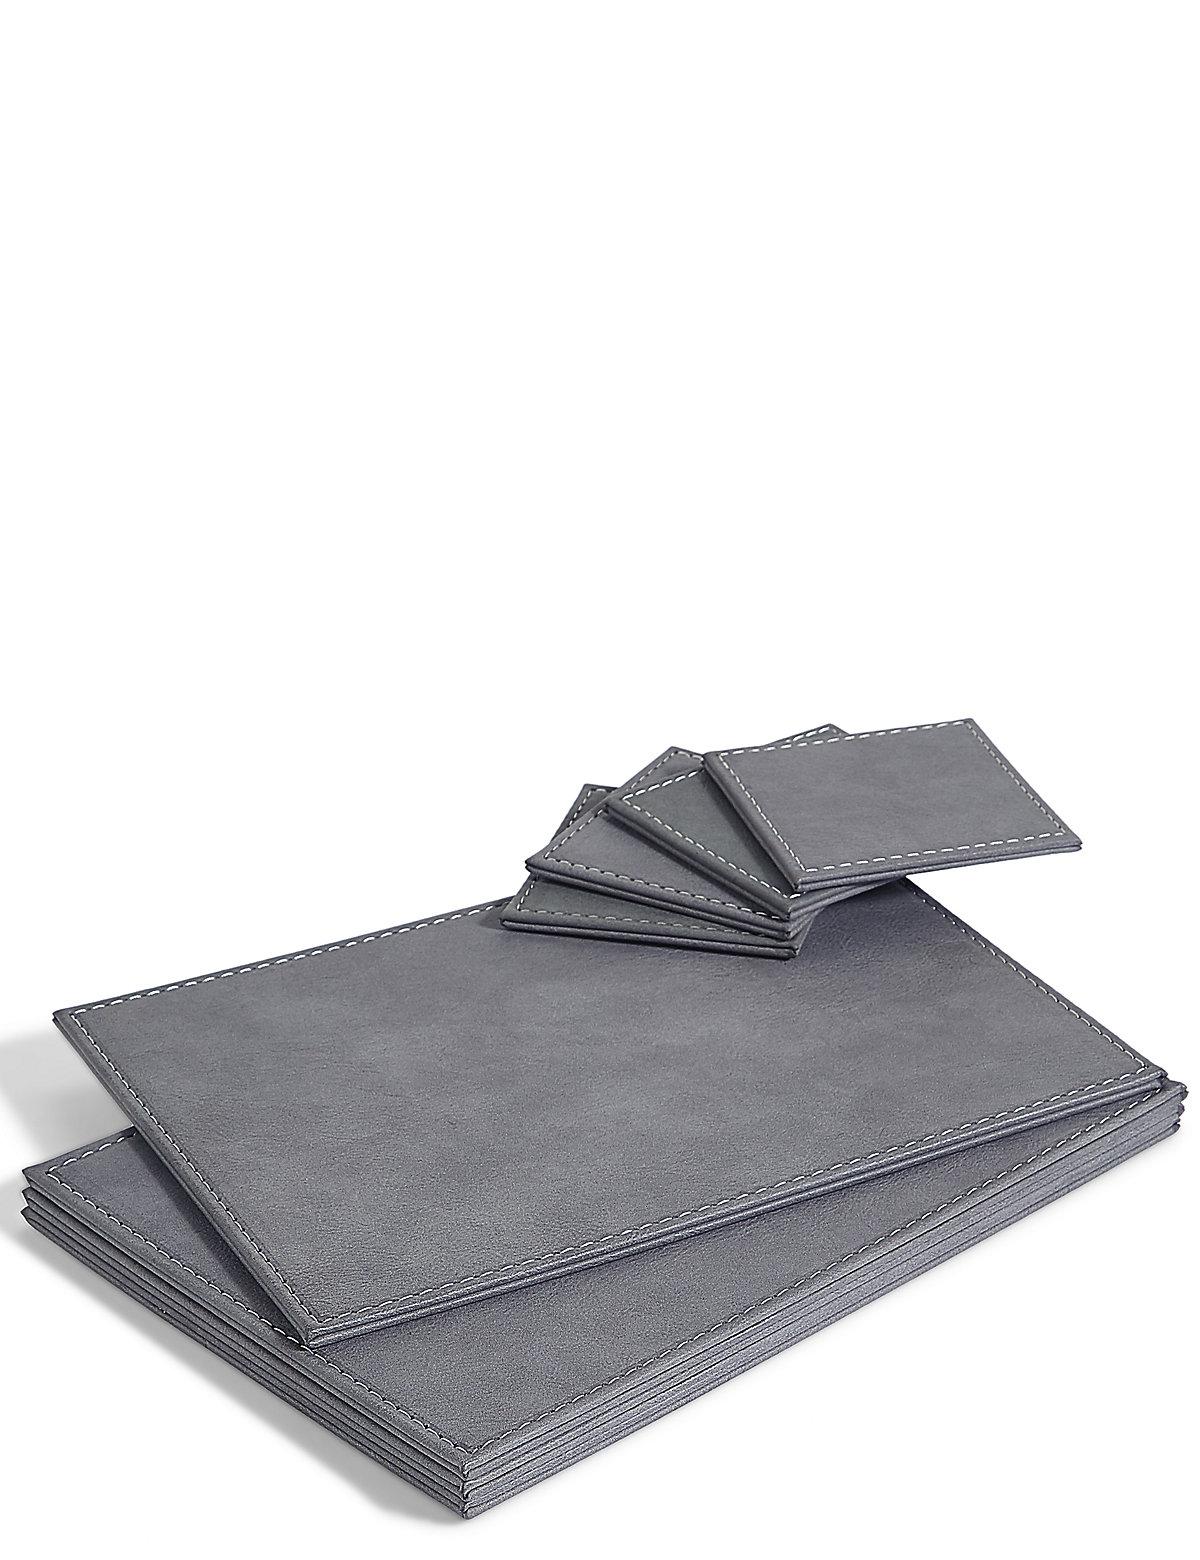 Faux Leather Placemat & Coaster Set